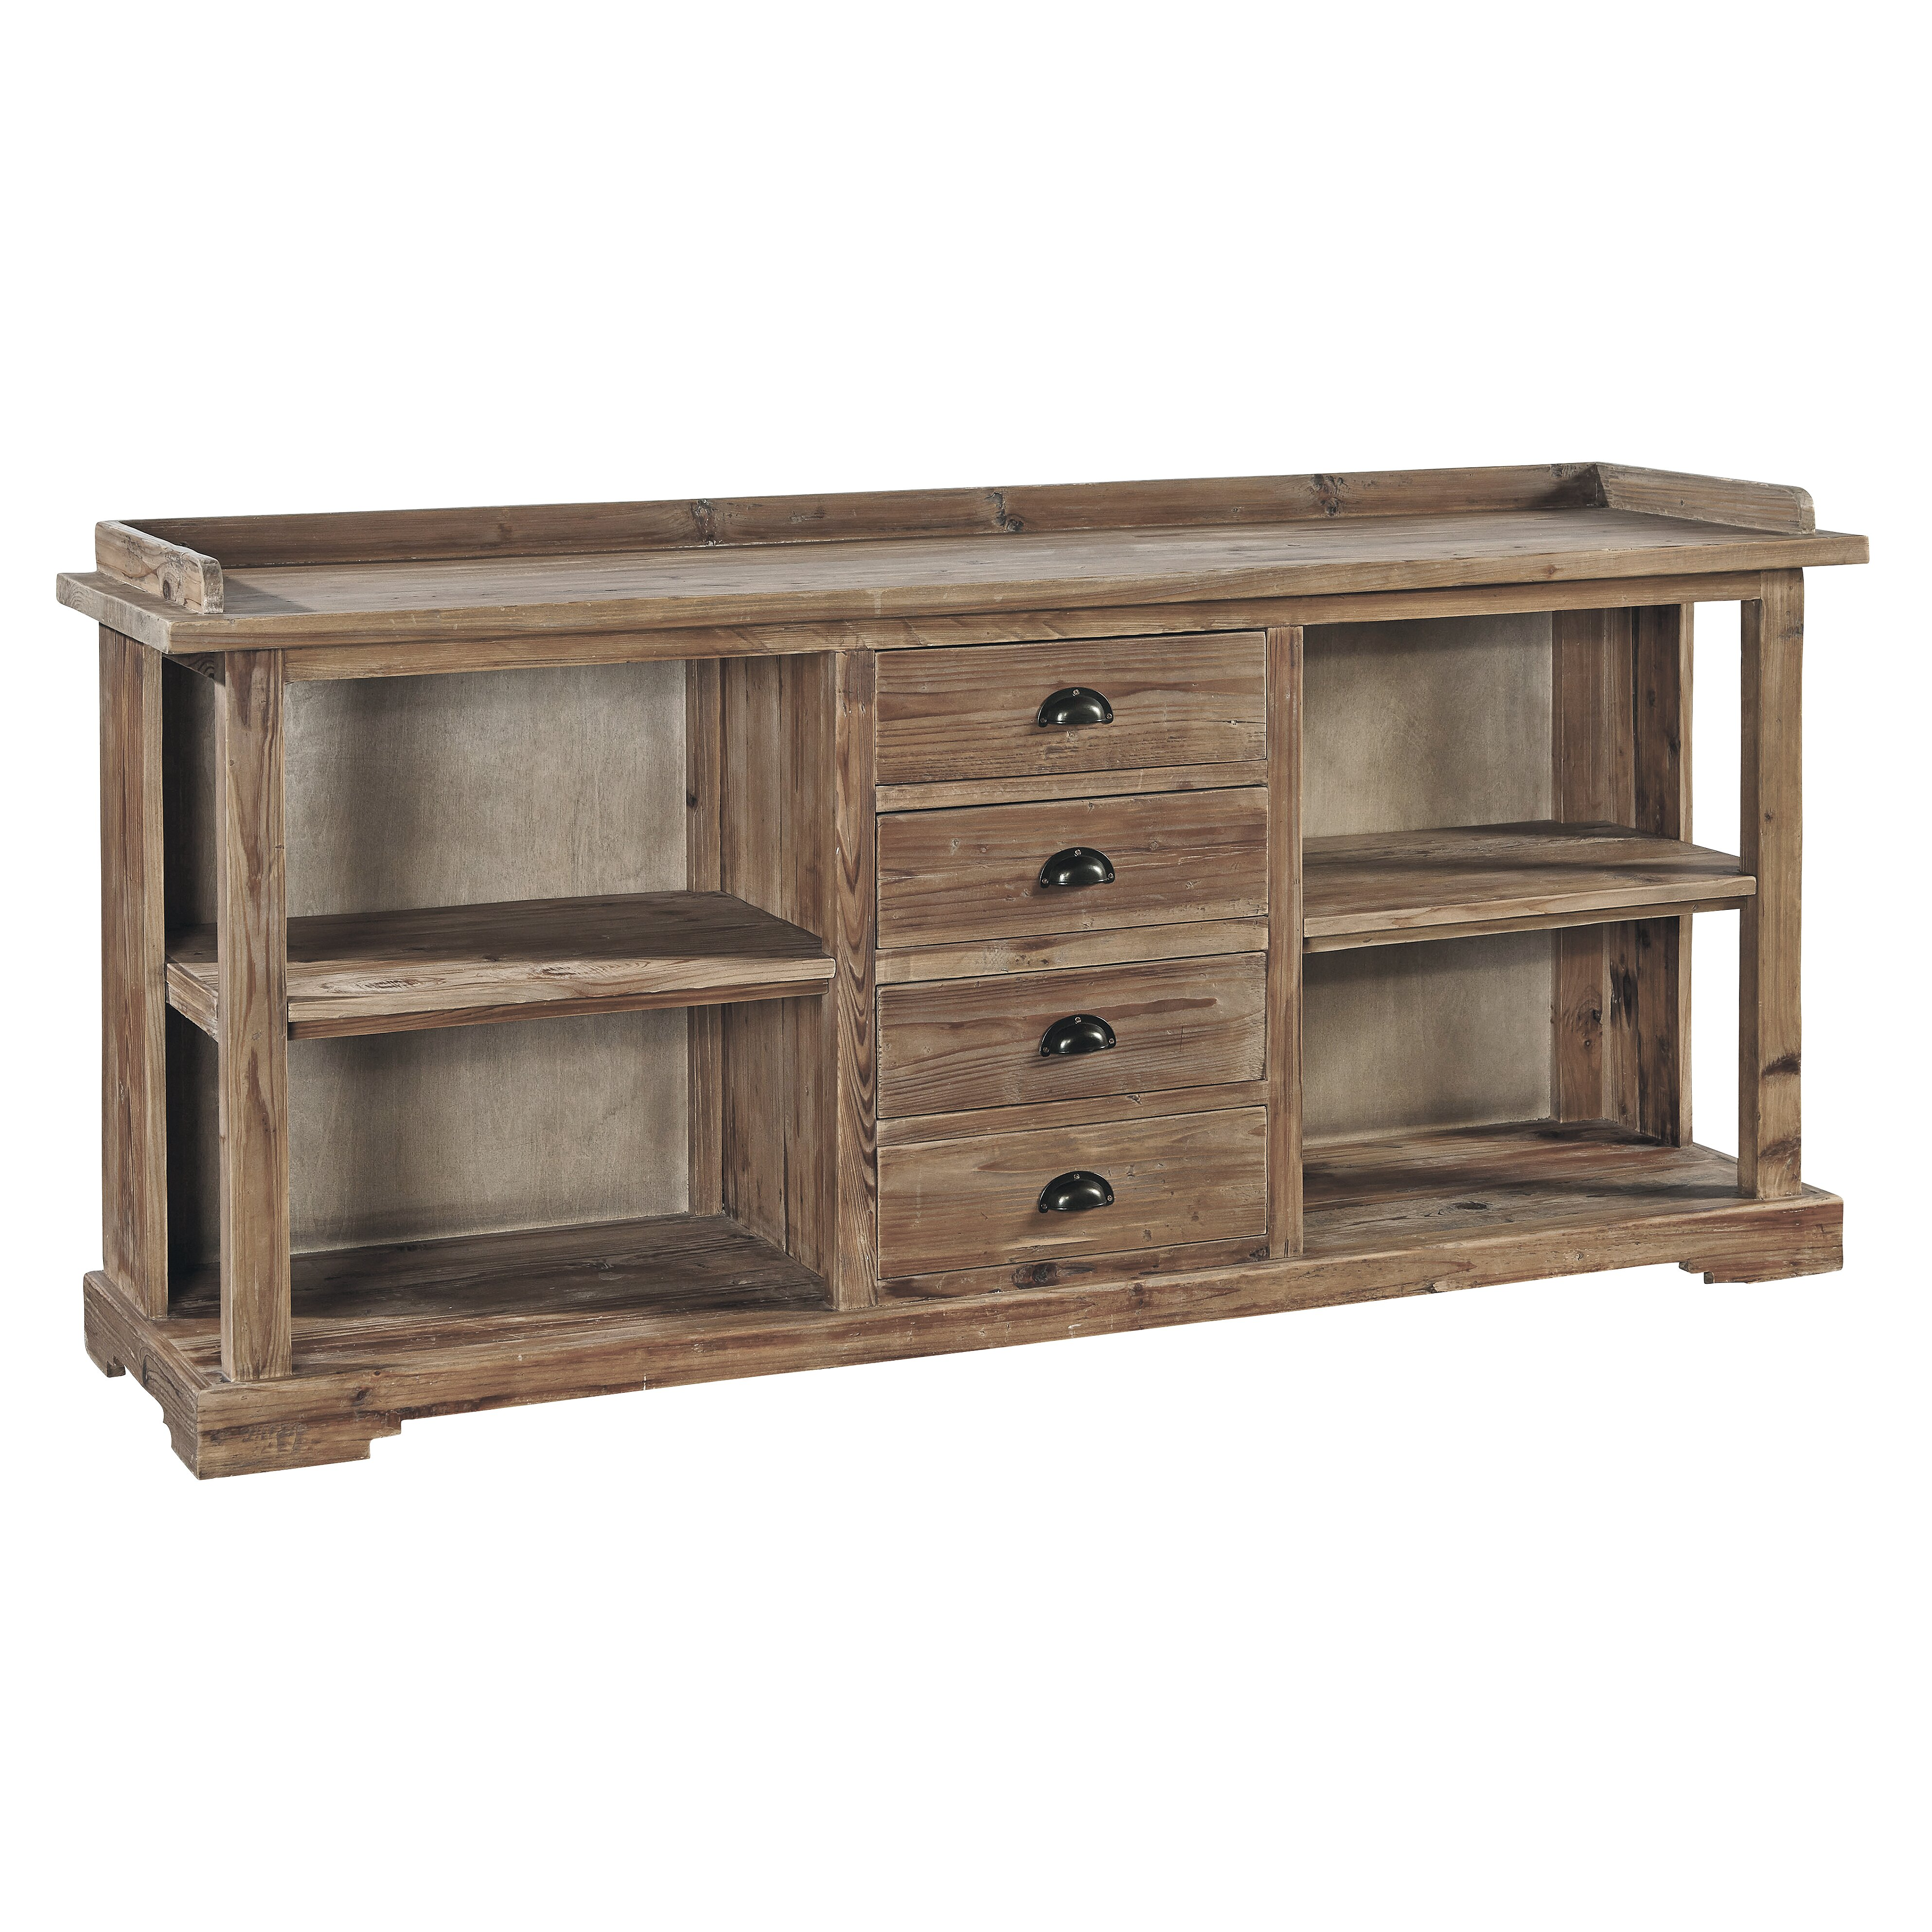 Furniture Classics Ltd Old Fir Sideboard Reviews Wayfair